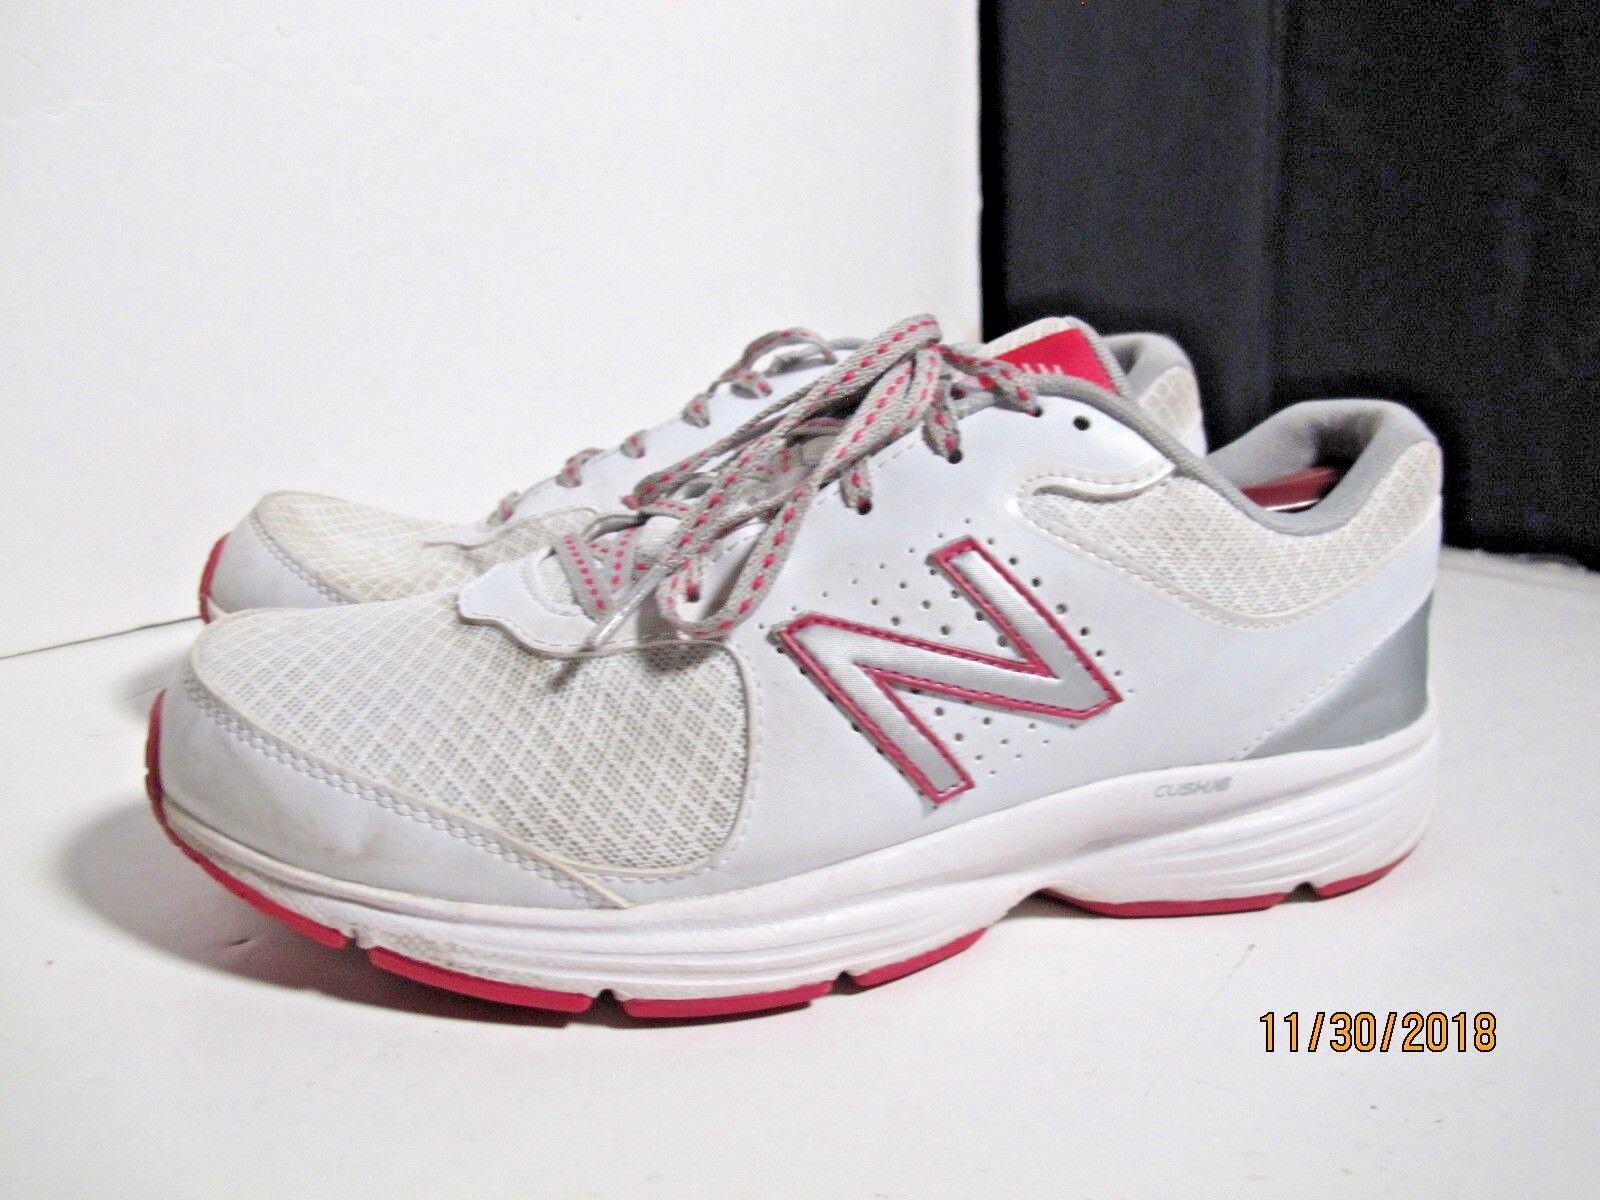 New Balance Women's 411v2 Walking Shoes